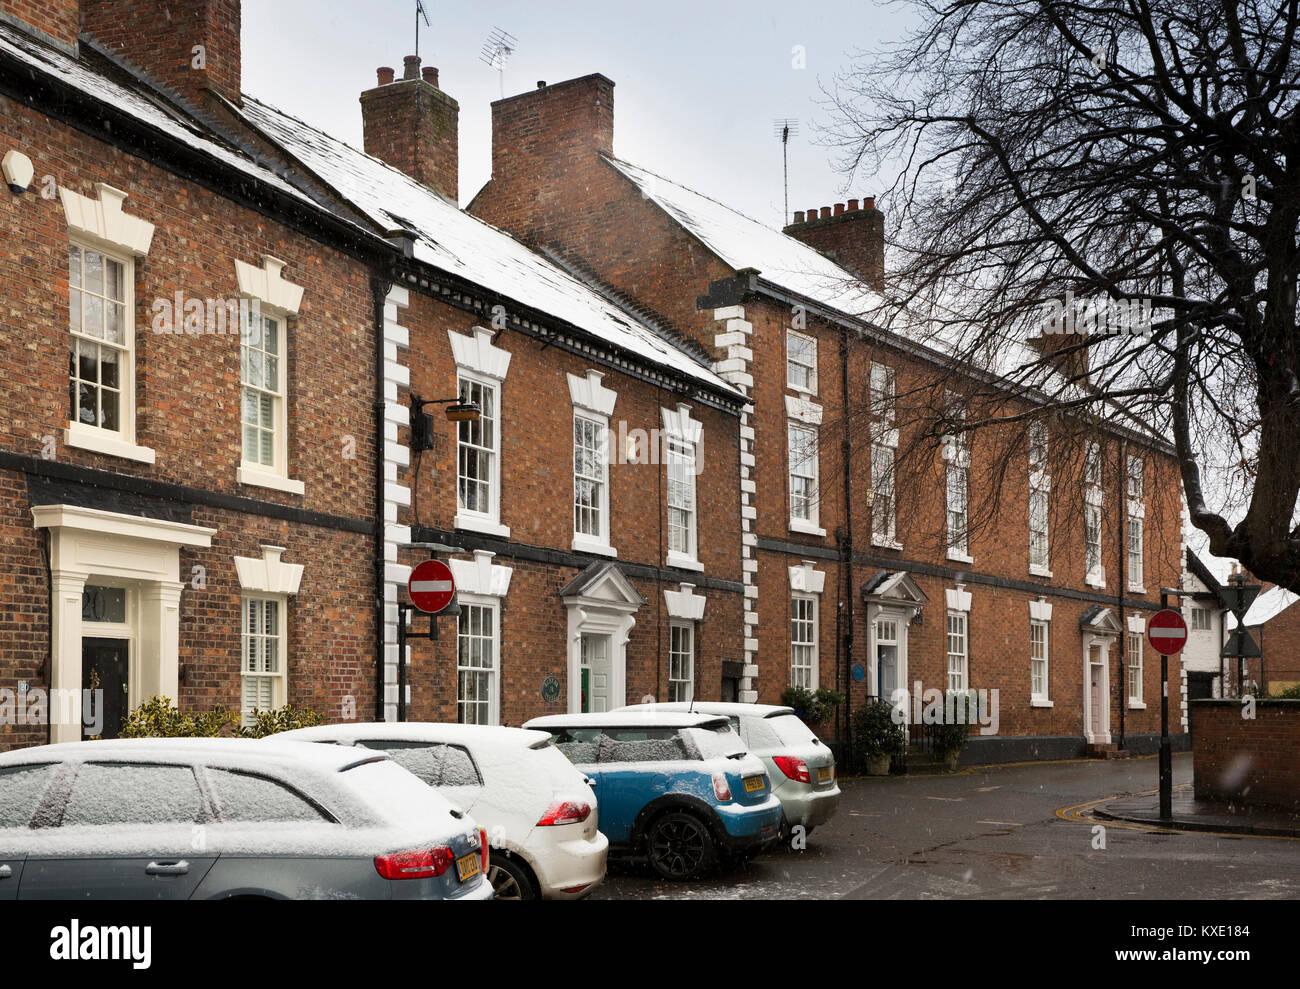 UK, England, Cheshire, Nantwich, Love Lane, elegant Georgian houses on cul-de-sac in winter - Stock Image